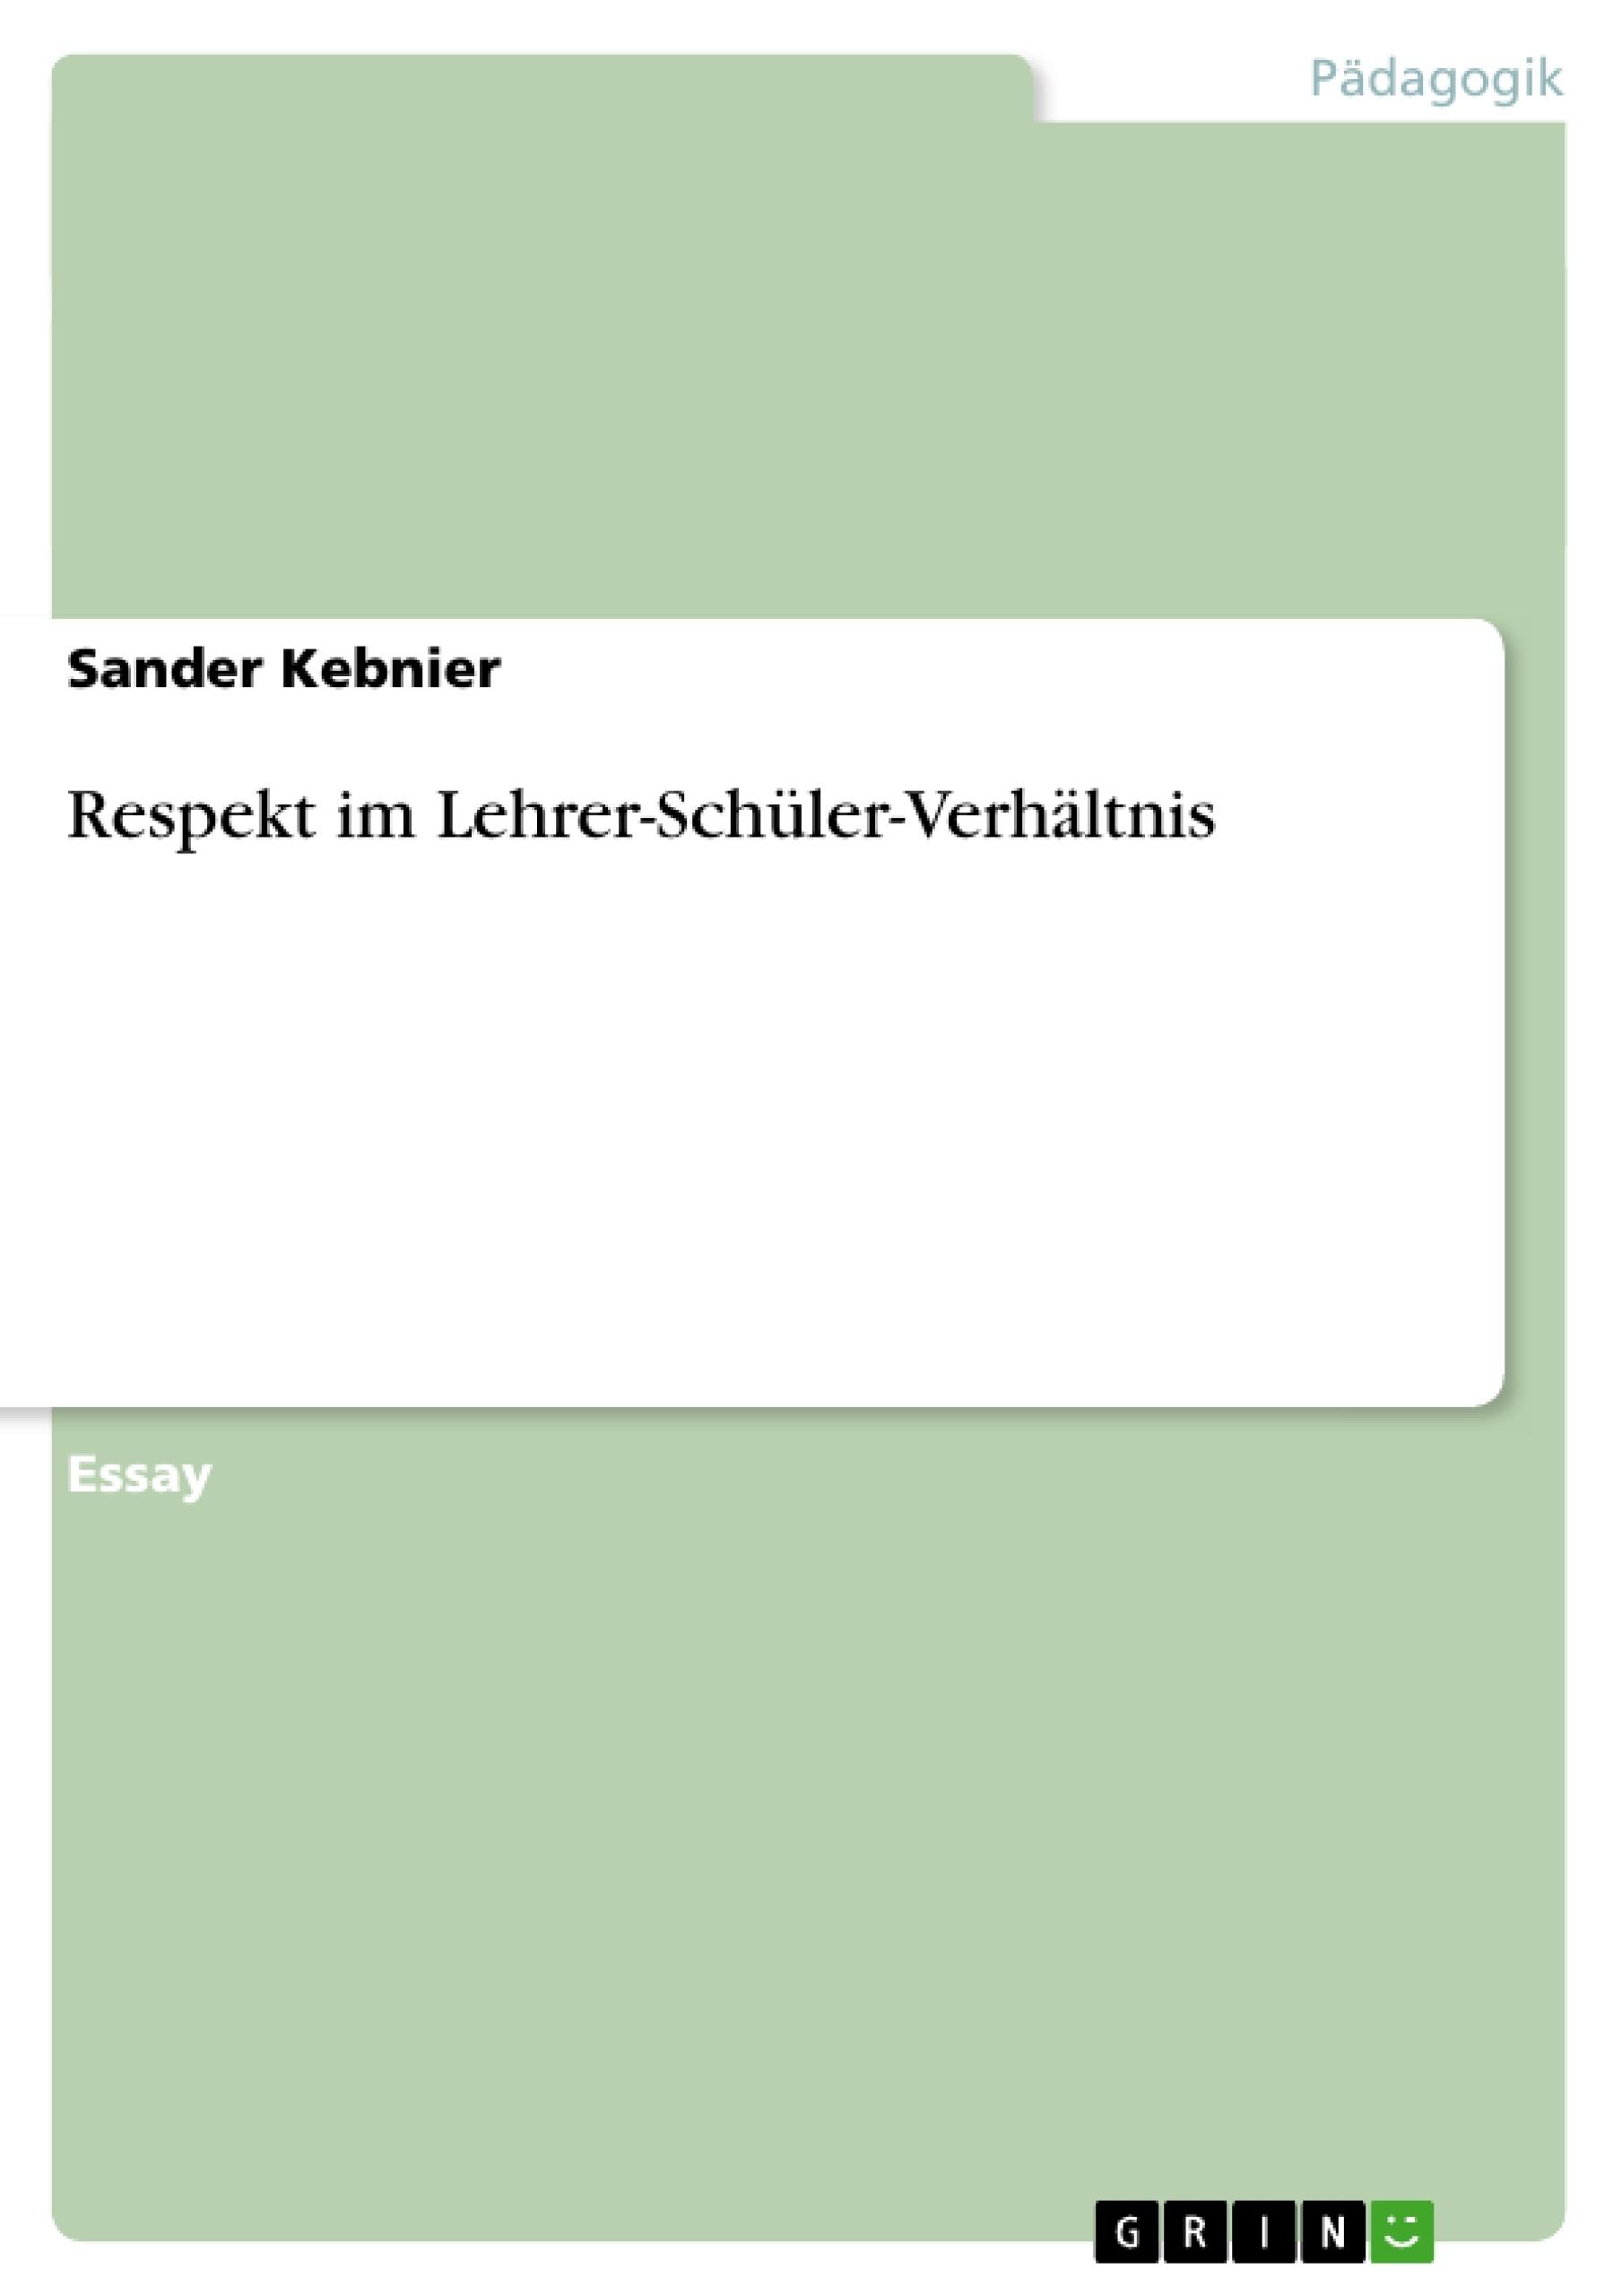 Titel: Respekt im Lehrer-Schüler-Verhältnis